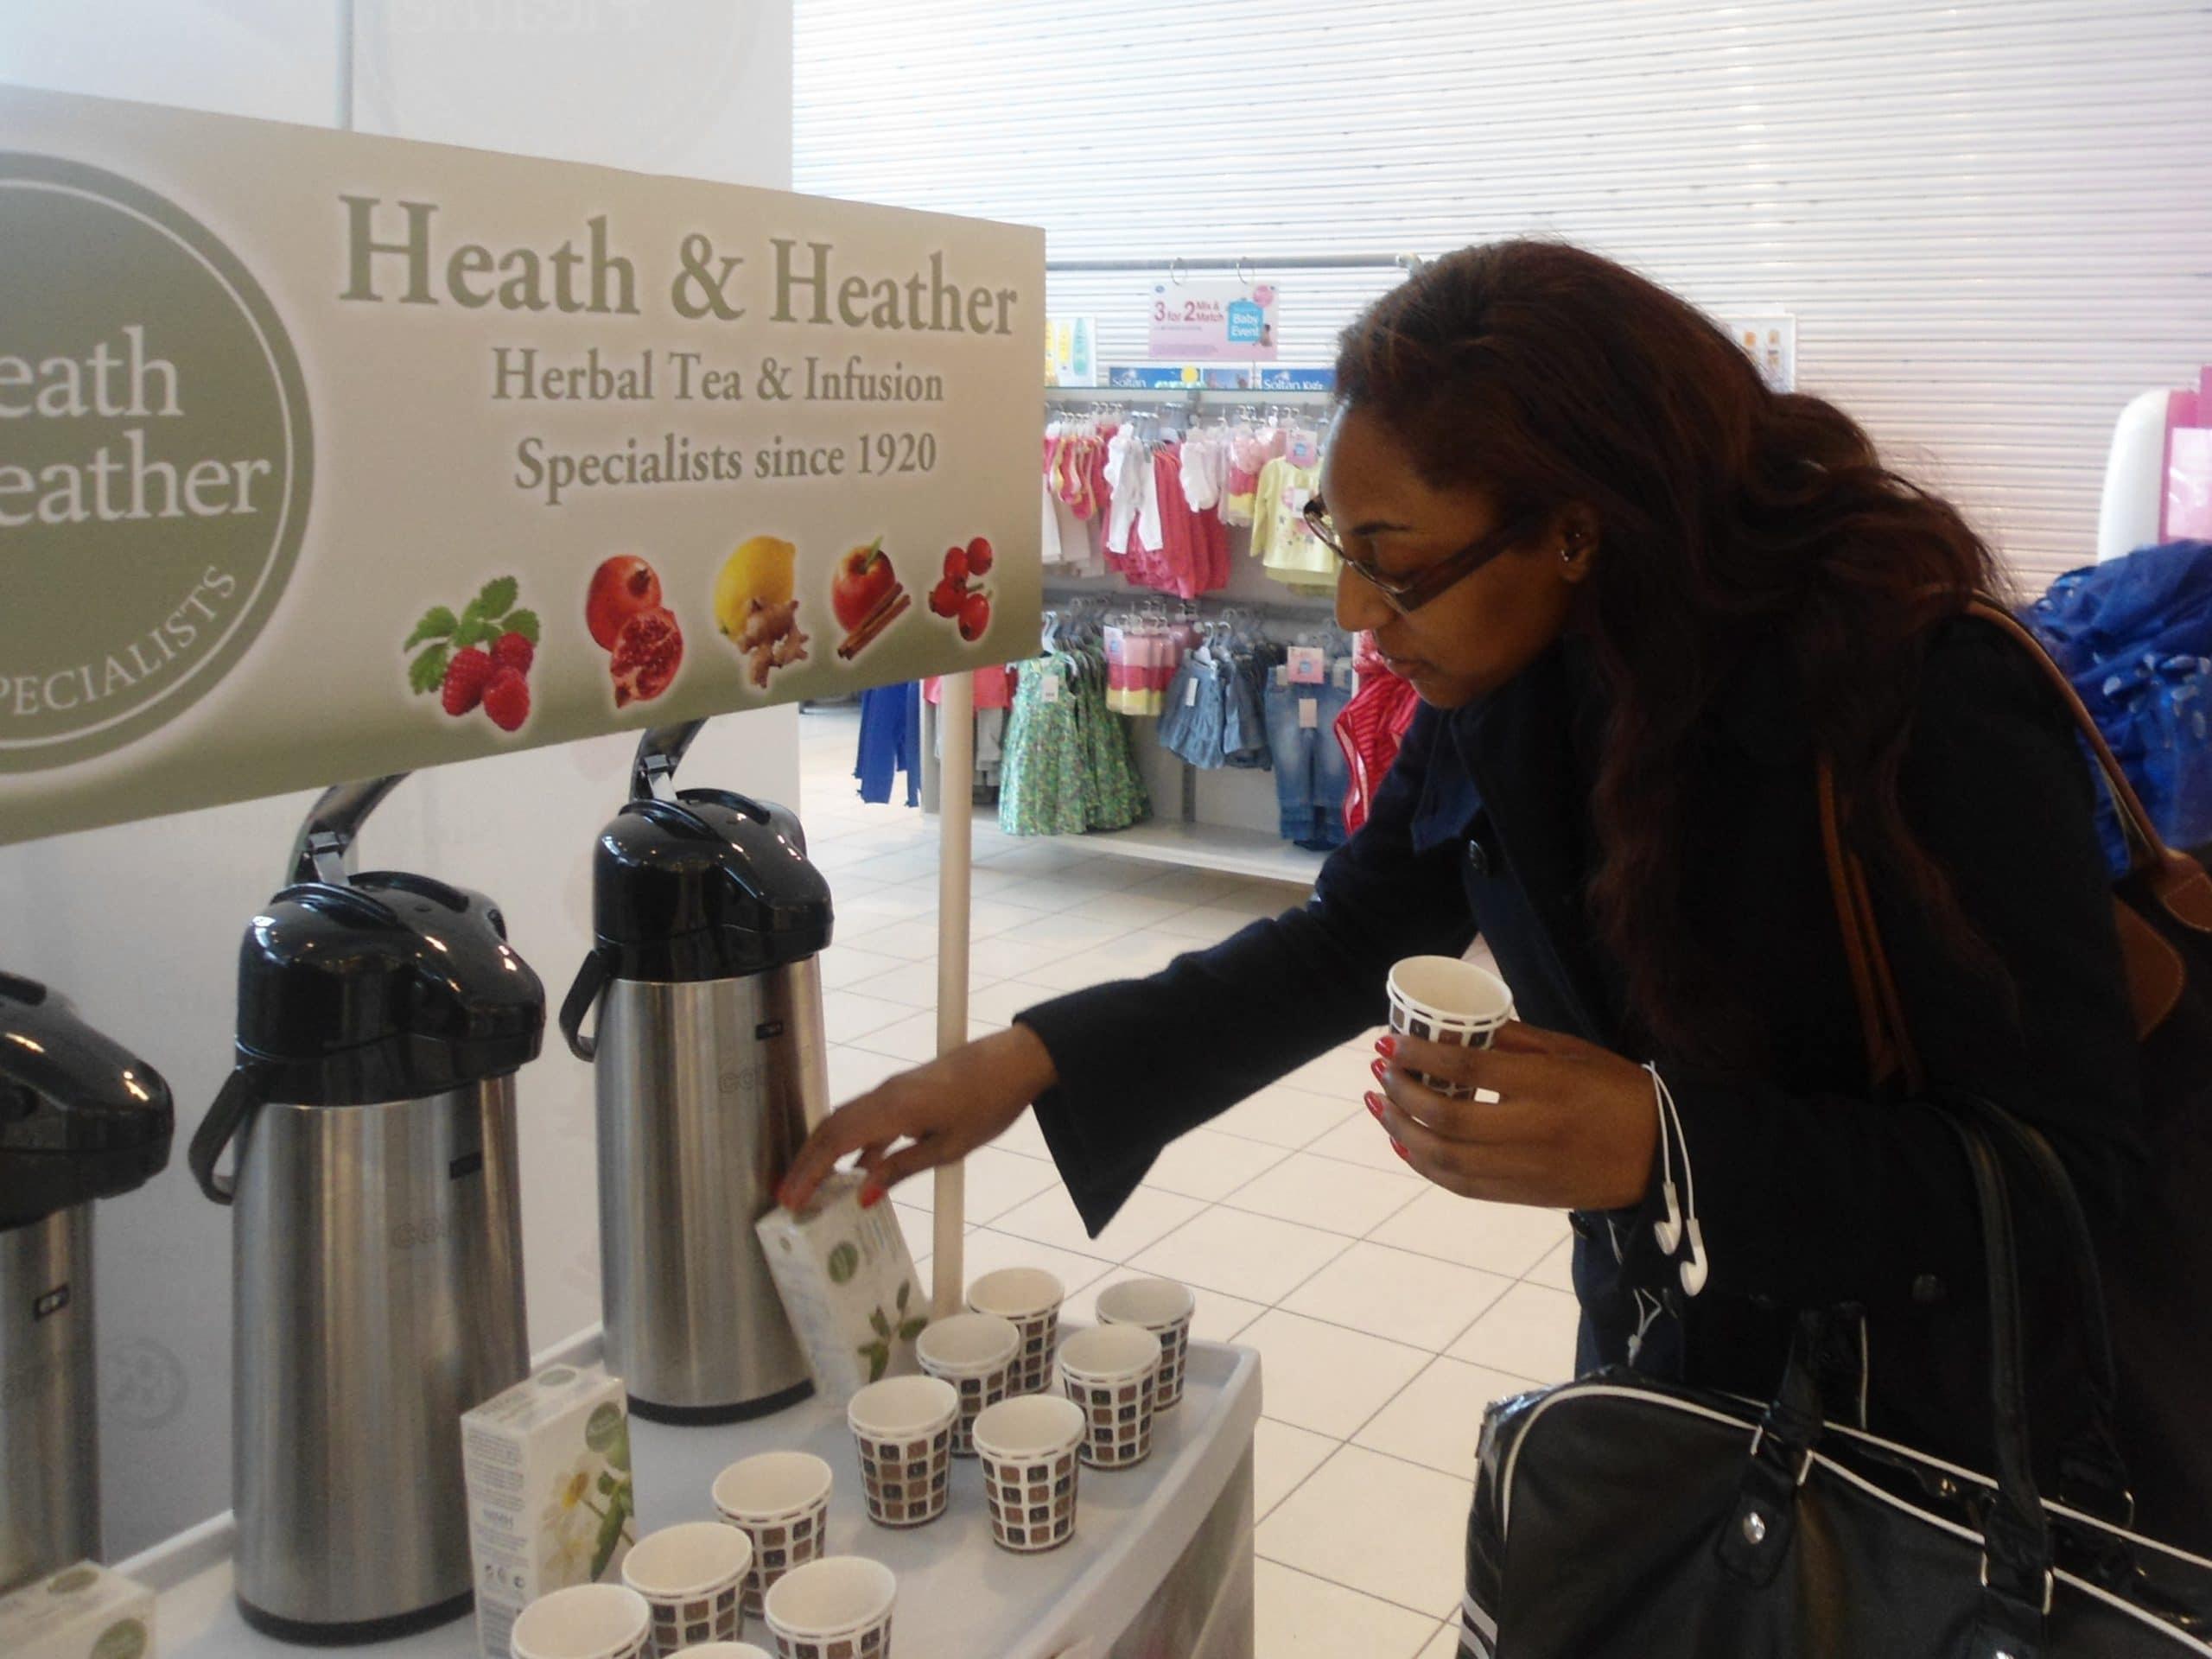 On aisle supermarket product Sampling, active campaign, affiliate marketing, shopper marketing, promotion